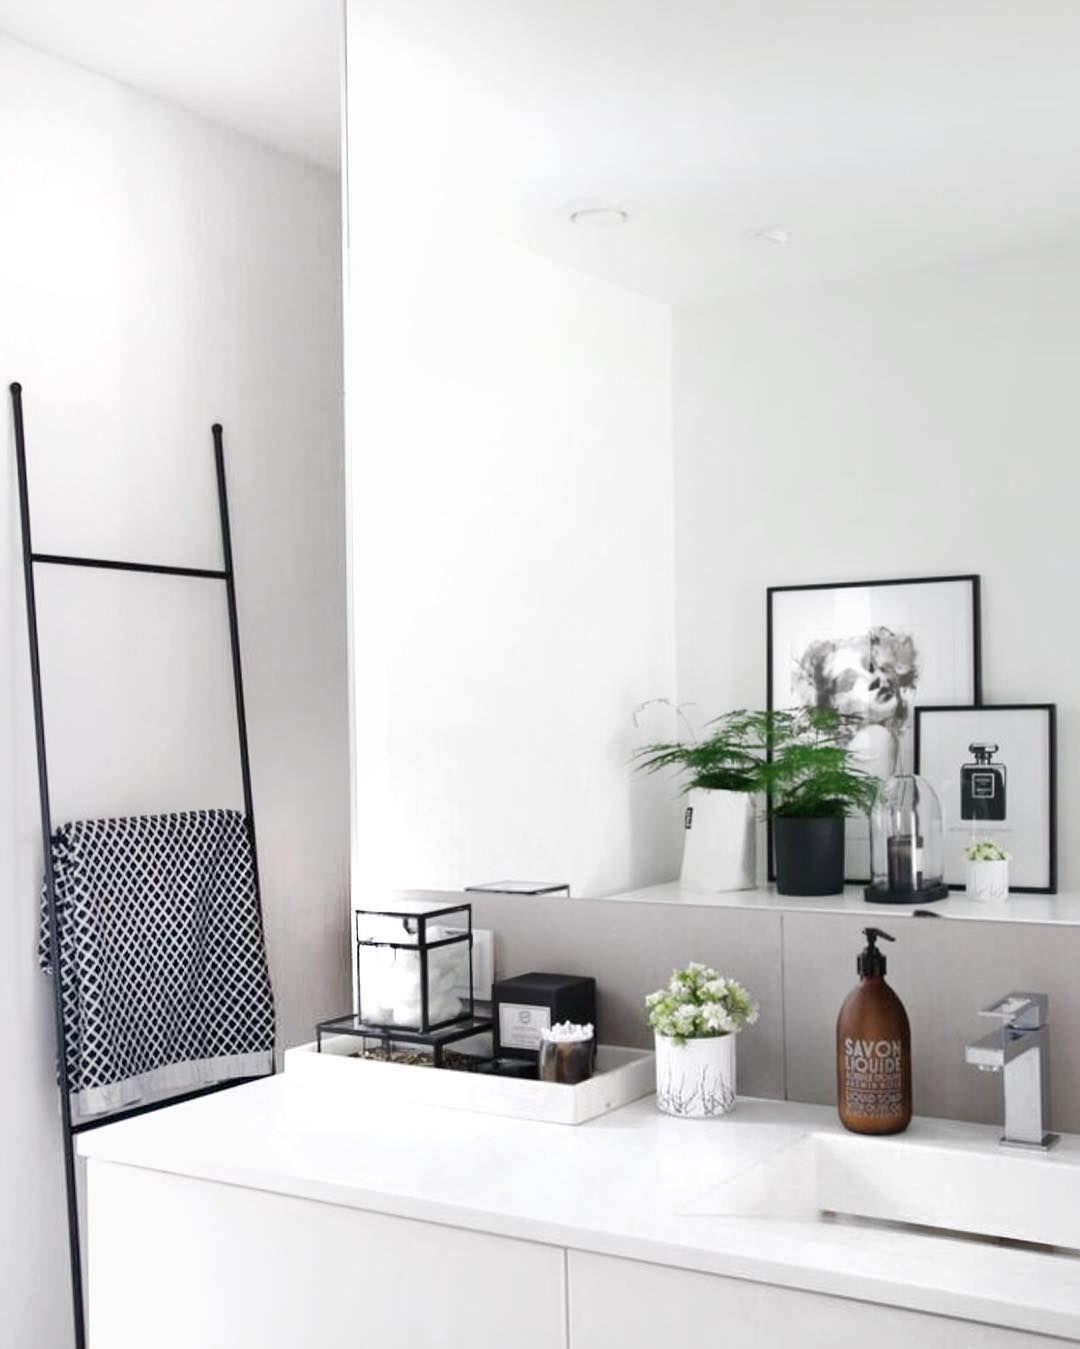 Good morning Starting here #morning #bythereseknutsen #bathroom #myhome #scandinavianinterior #interior4all #skandinaviskehjem #interior #interiør by bythereseknutsenno